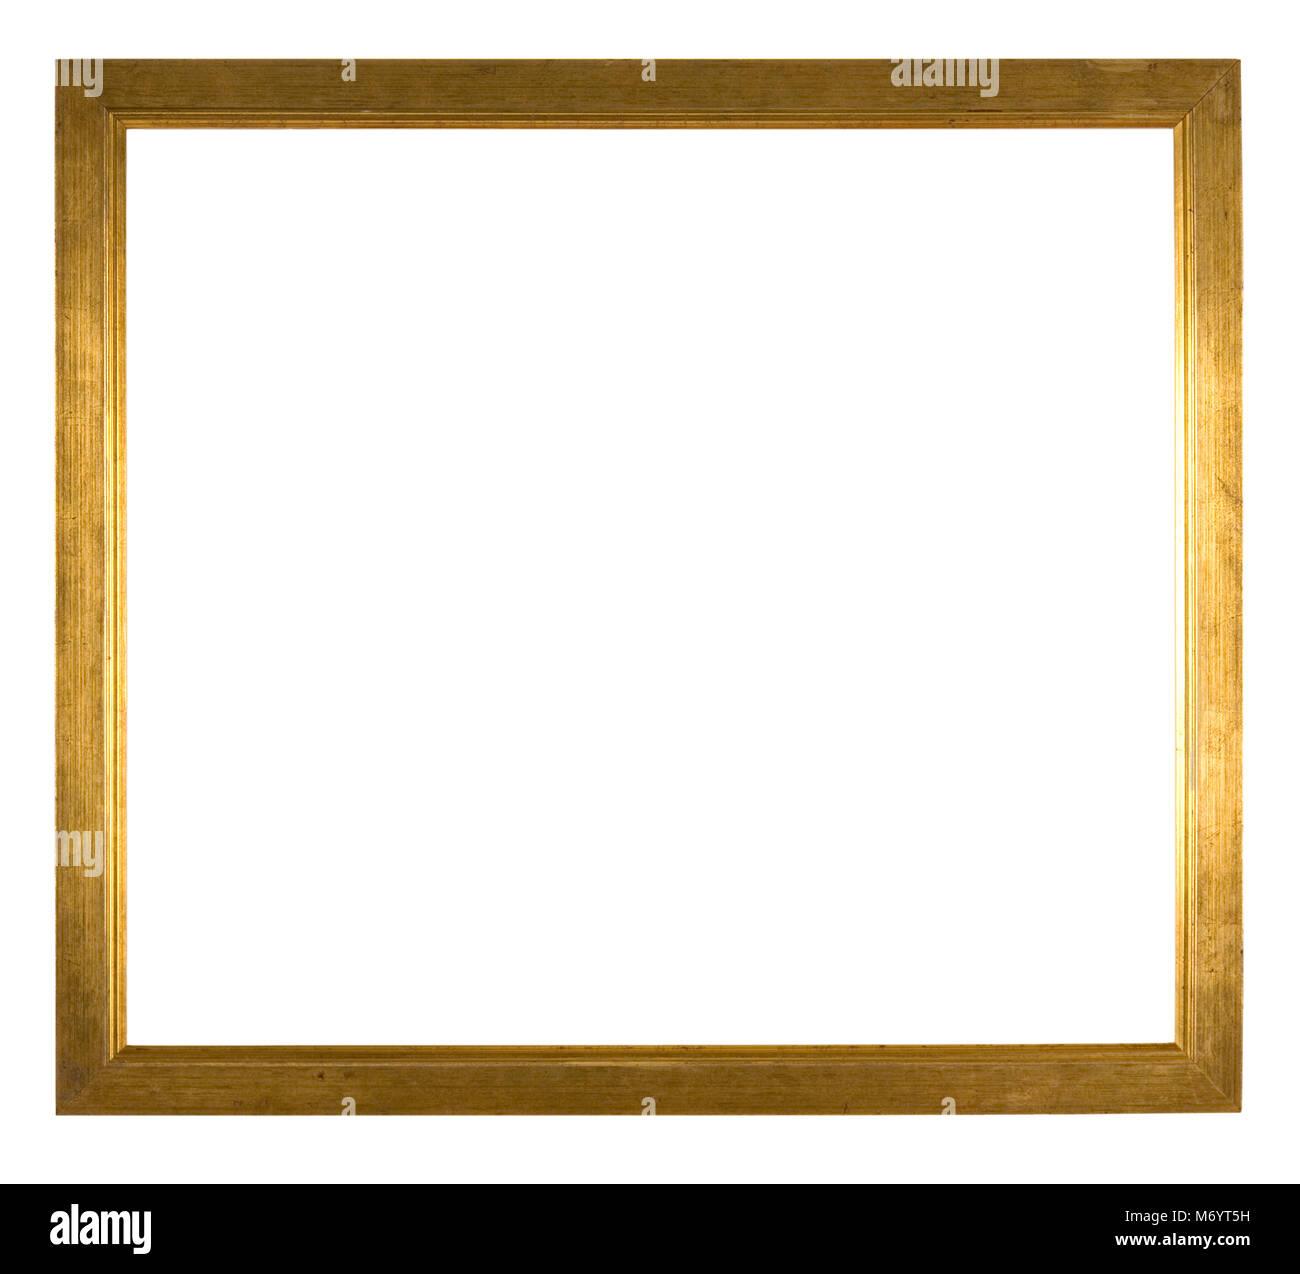 Großen, leeren Bilderrahmen, Distressed gold Finish Stockfoto, Bild ...